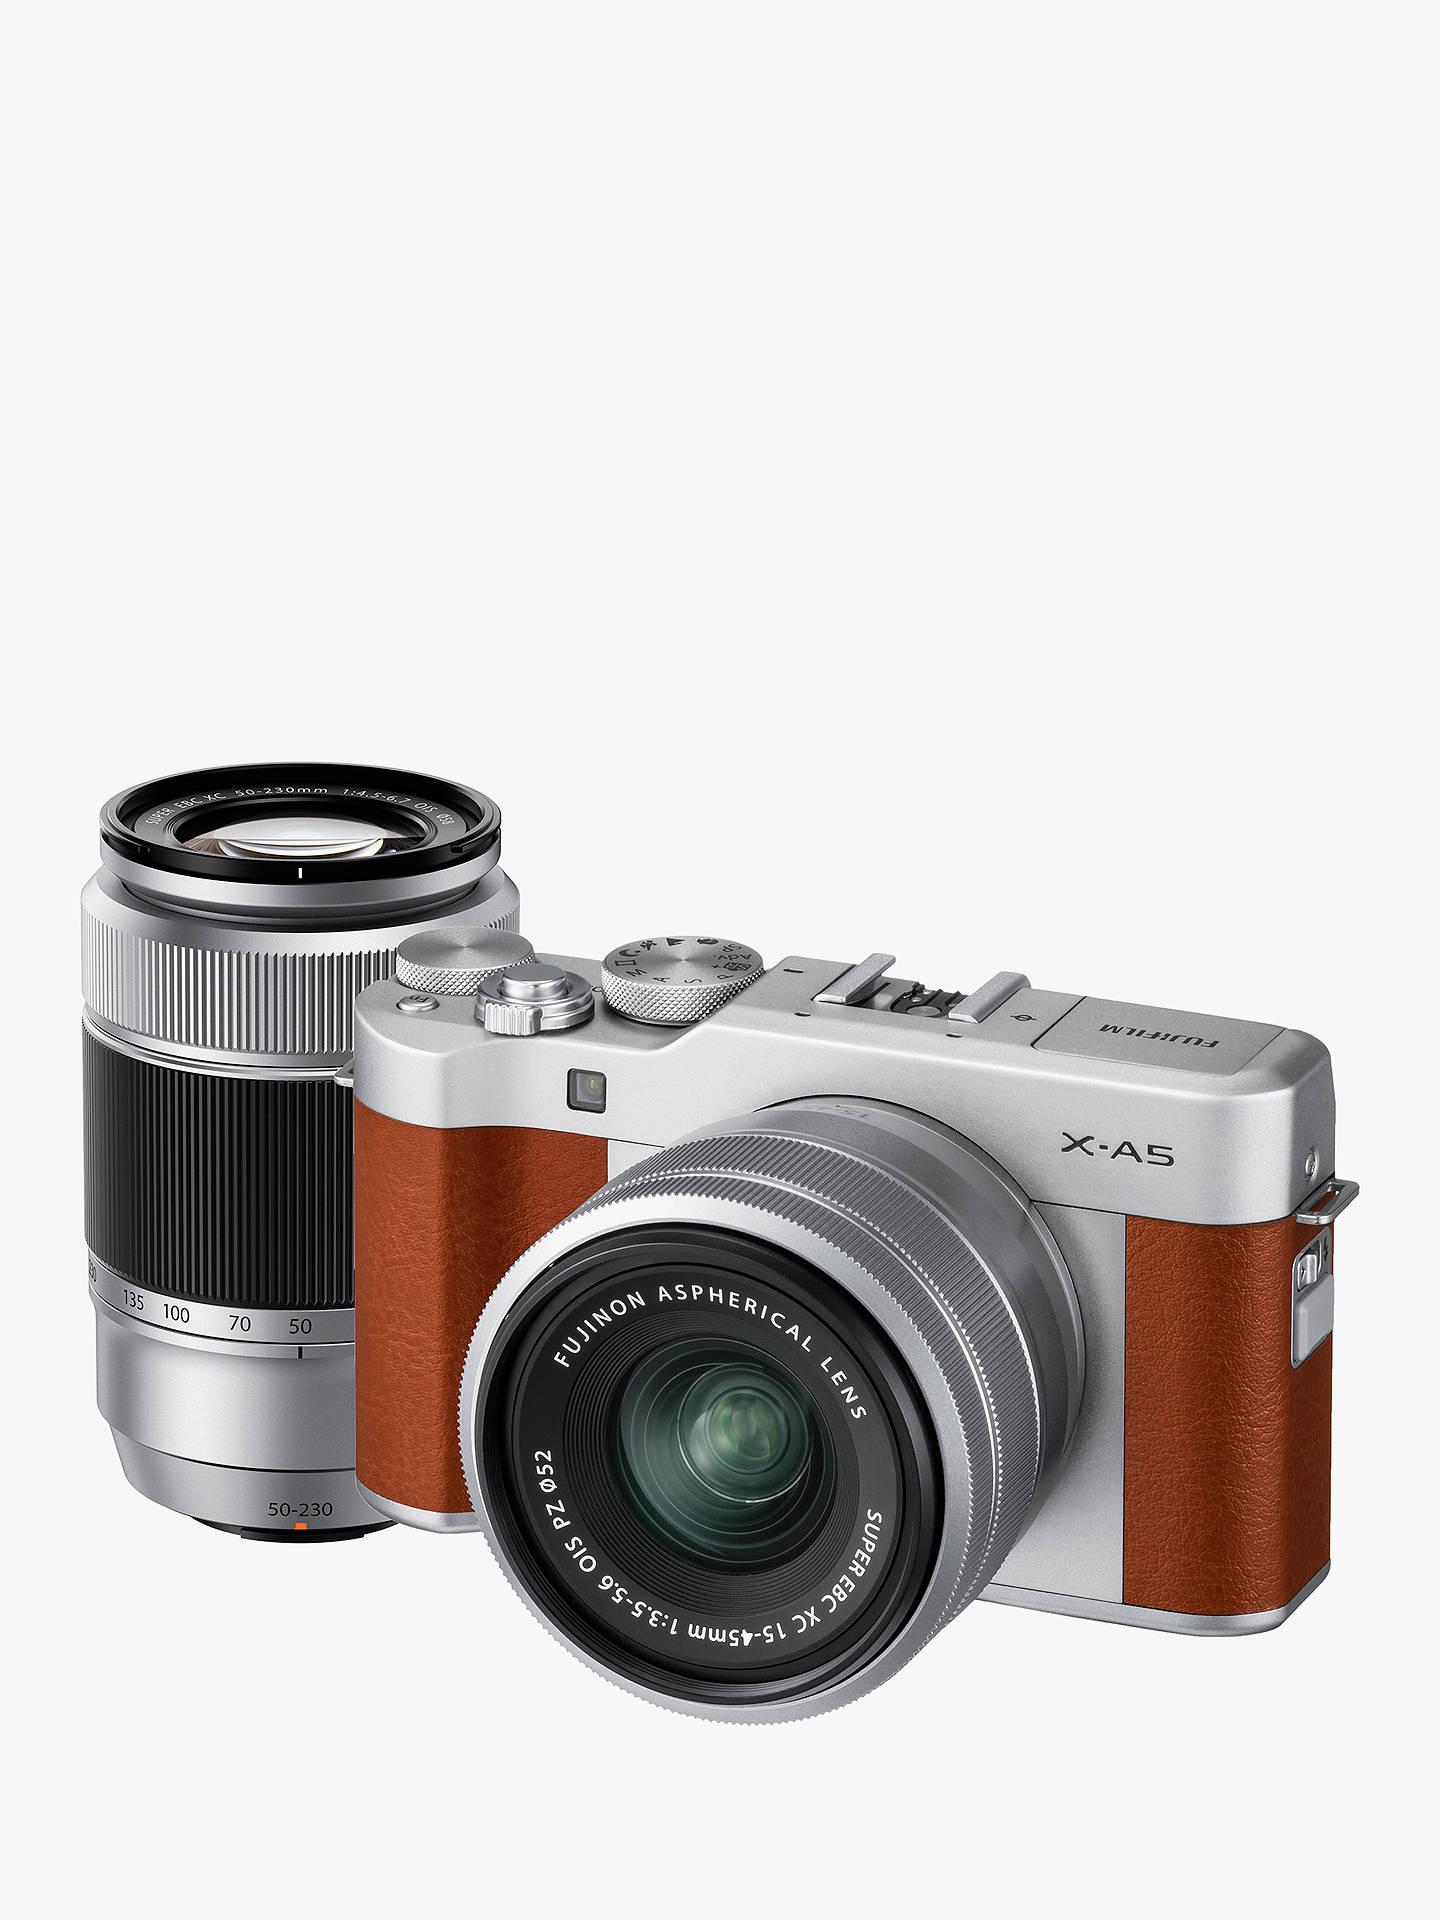 Fujifilm X-A5 Twin Lens Kit (15-45mm & 50-230mm) £349 @ John Lewis & Partners